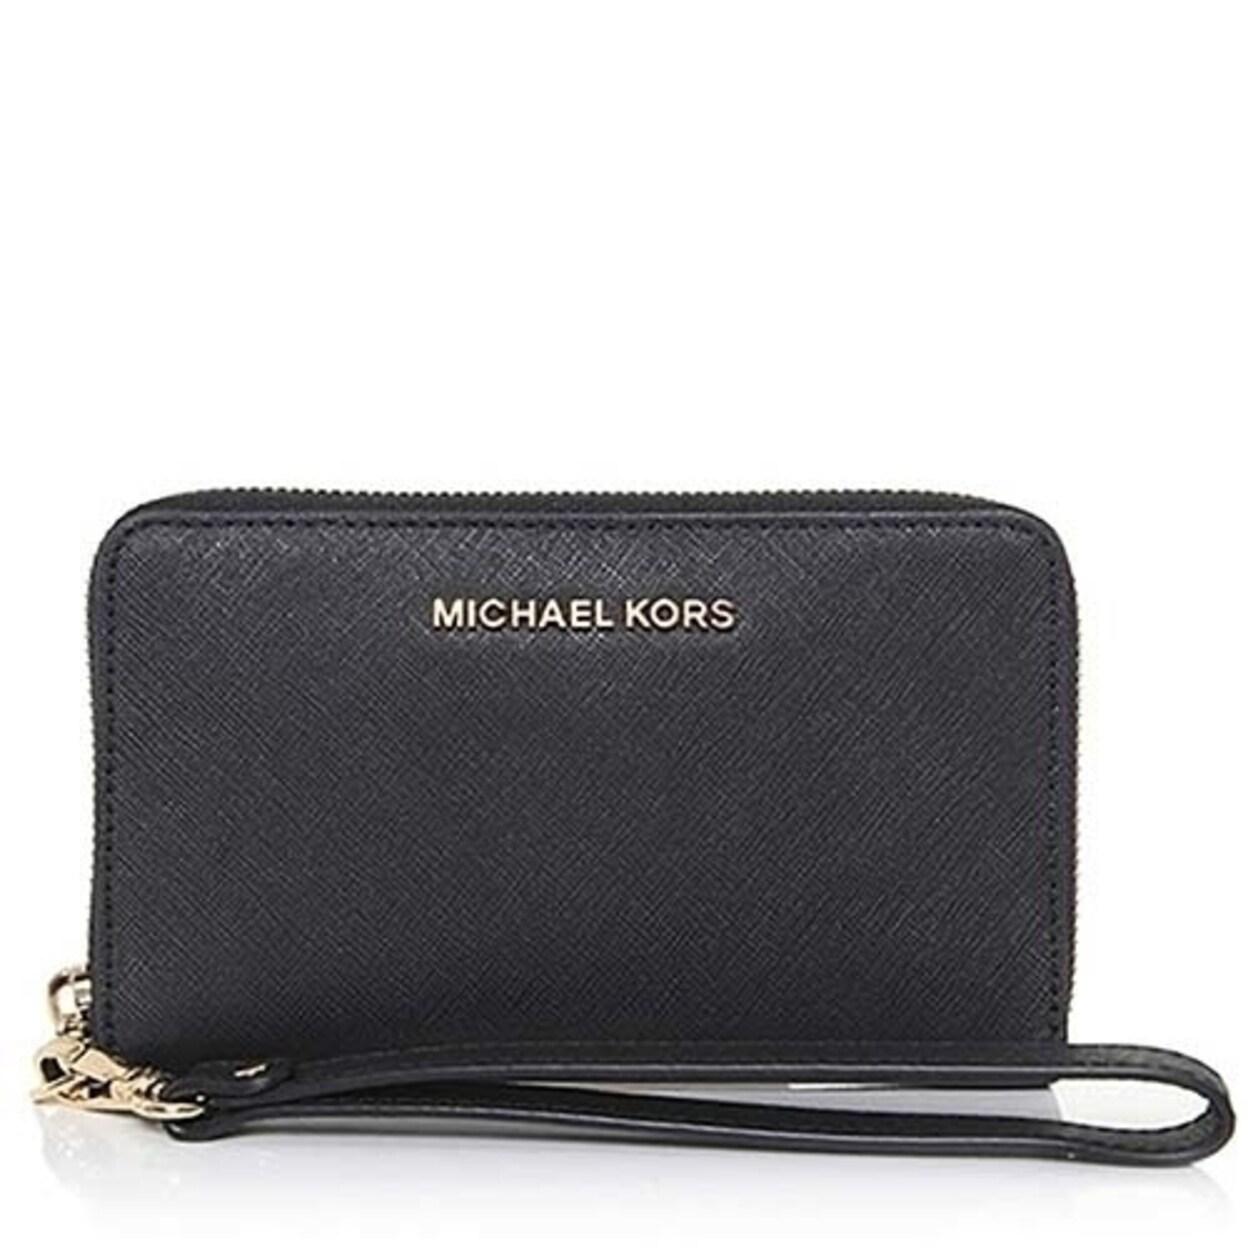 9e8161a3e6517a Michael Michael Kors Jet Set Travel Large Flat Multi-Function Phone Case  Saffiano Leather 18K